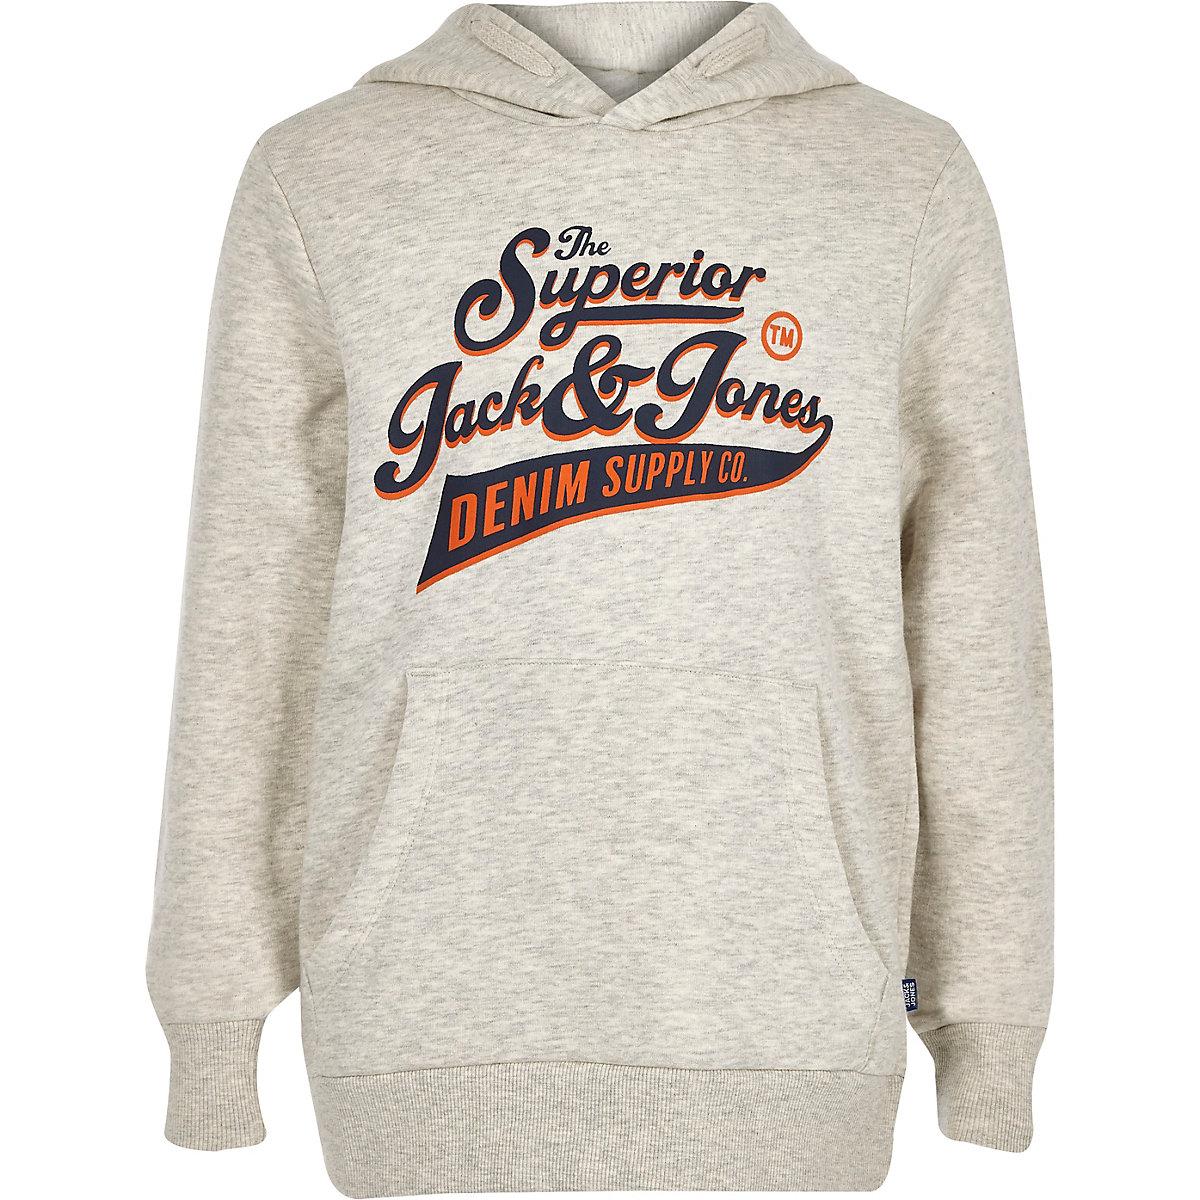 Boys Jack and Jones grey logo hoodie